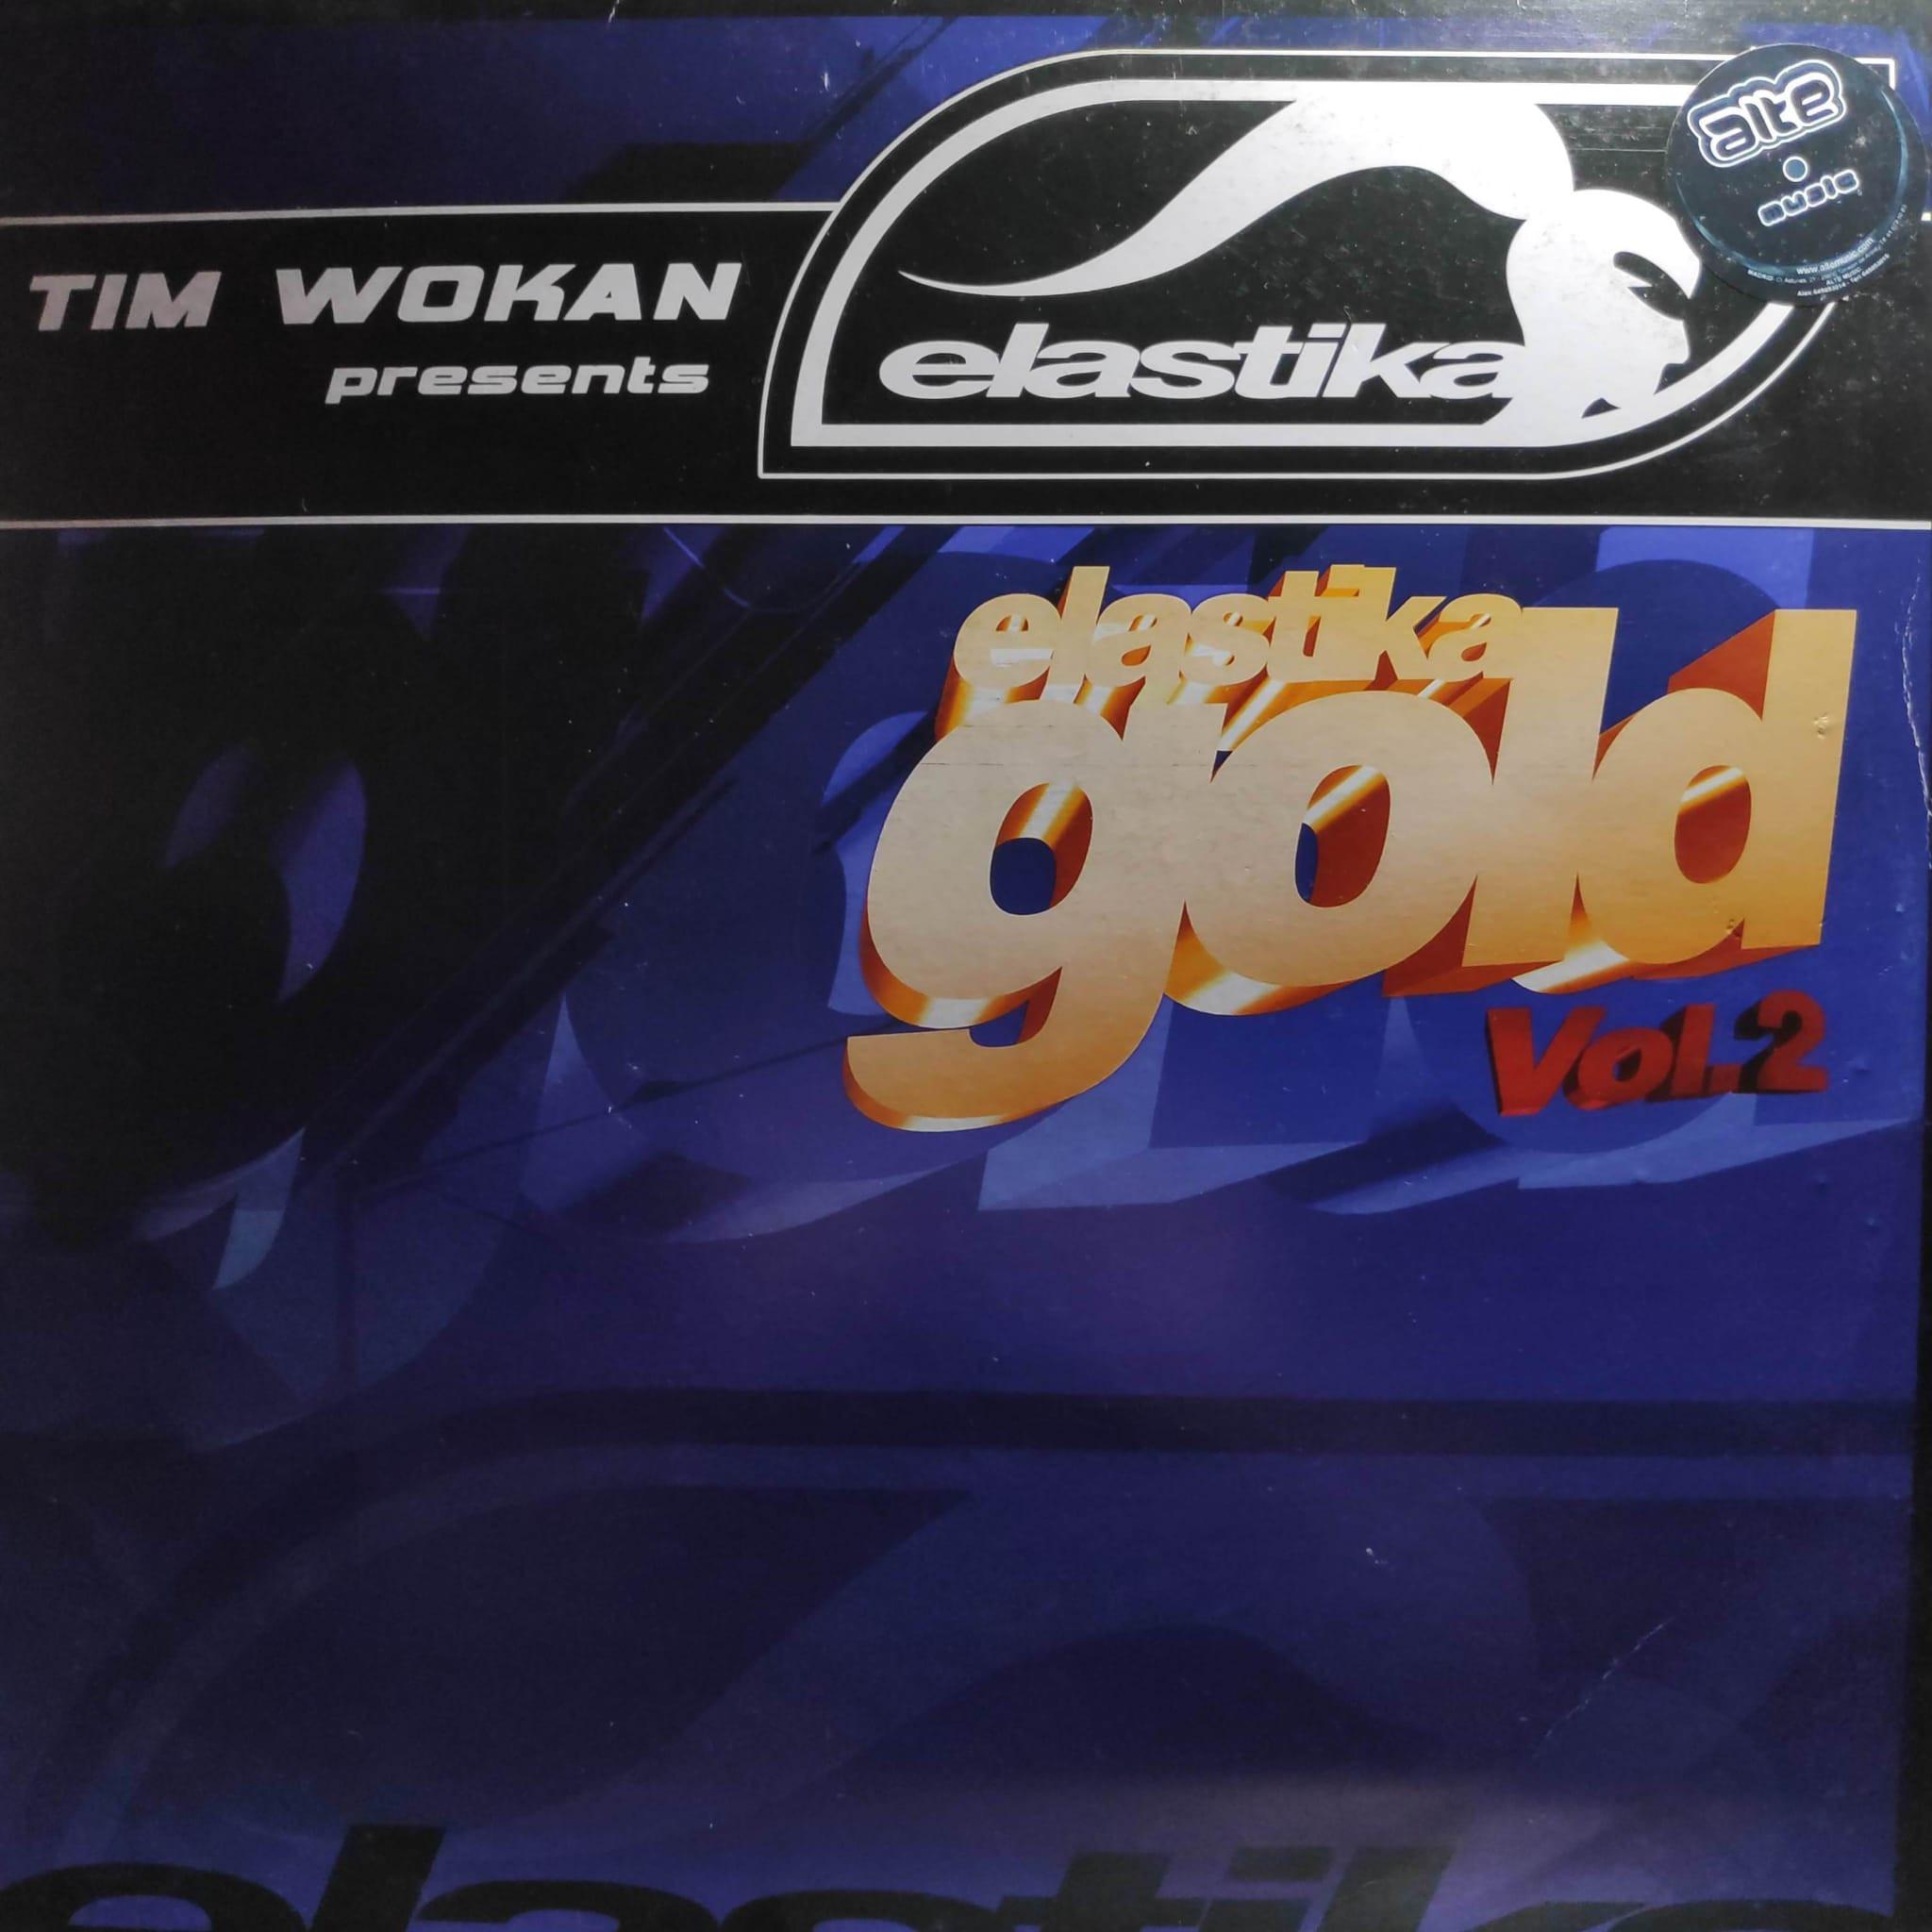 (P022) Tim Wokan – Elastika Gold Vol. 2